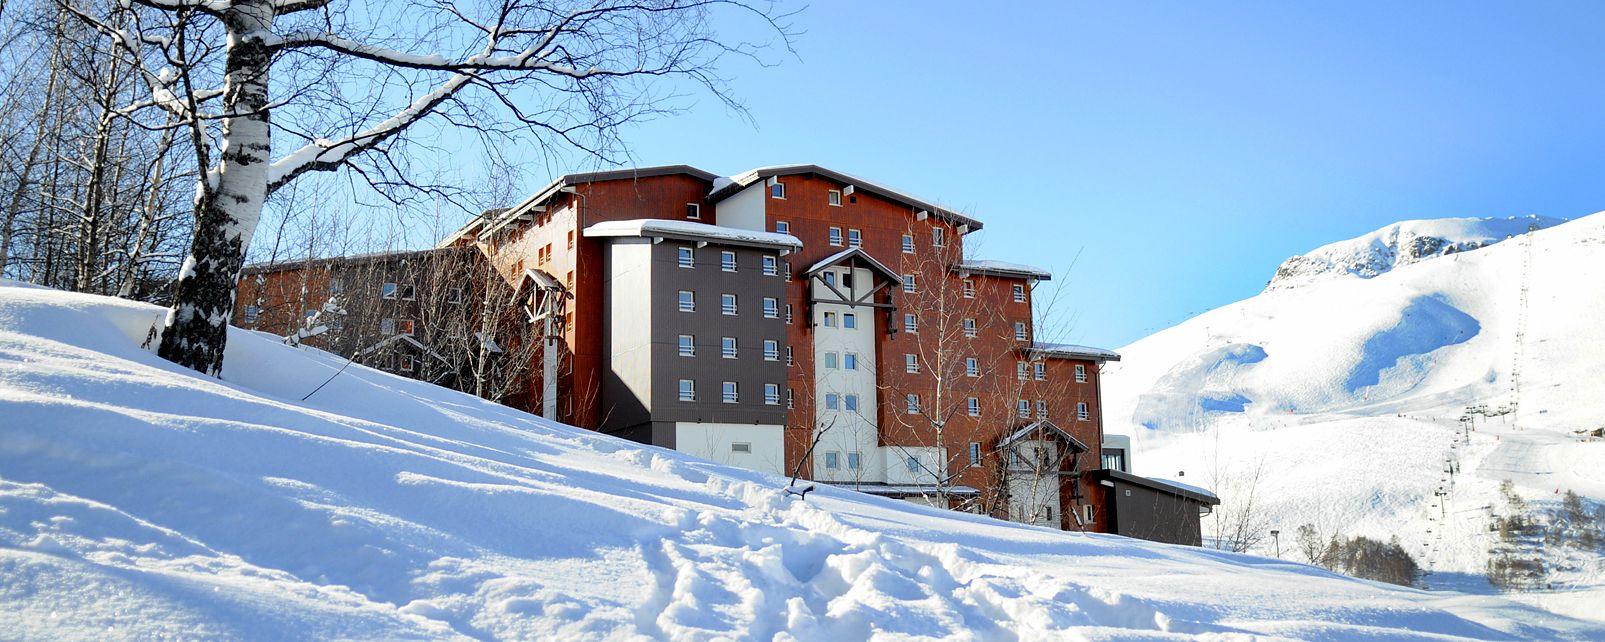 H tel club med les deux alpes les deux alpes france for Hotels 2 alpes